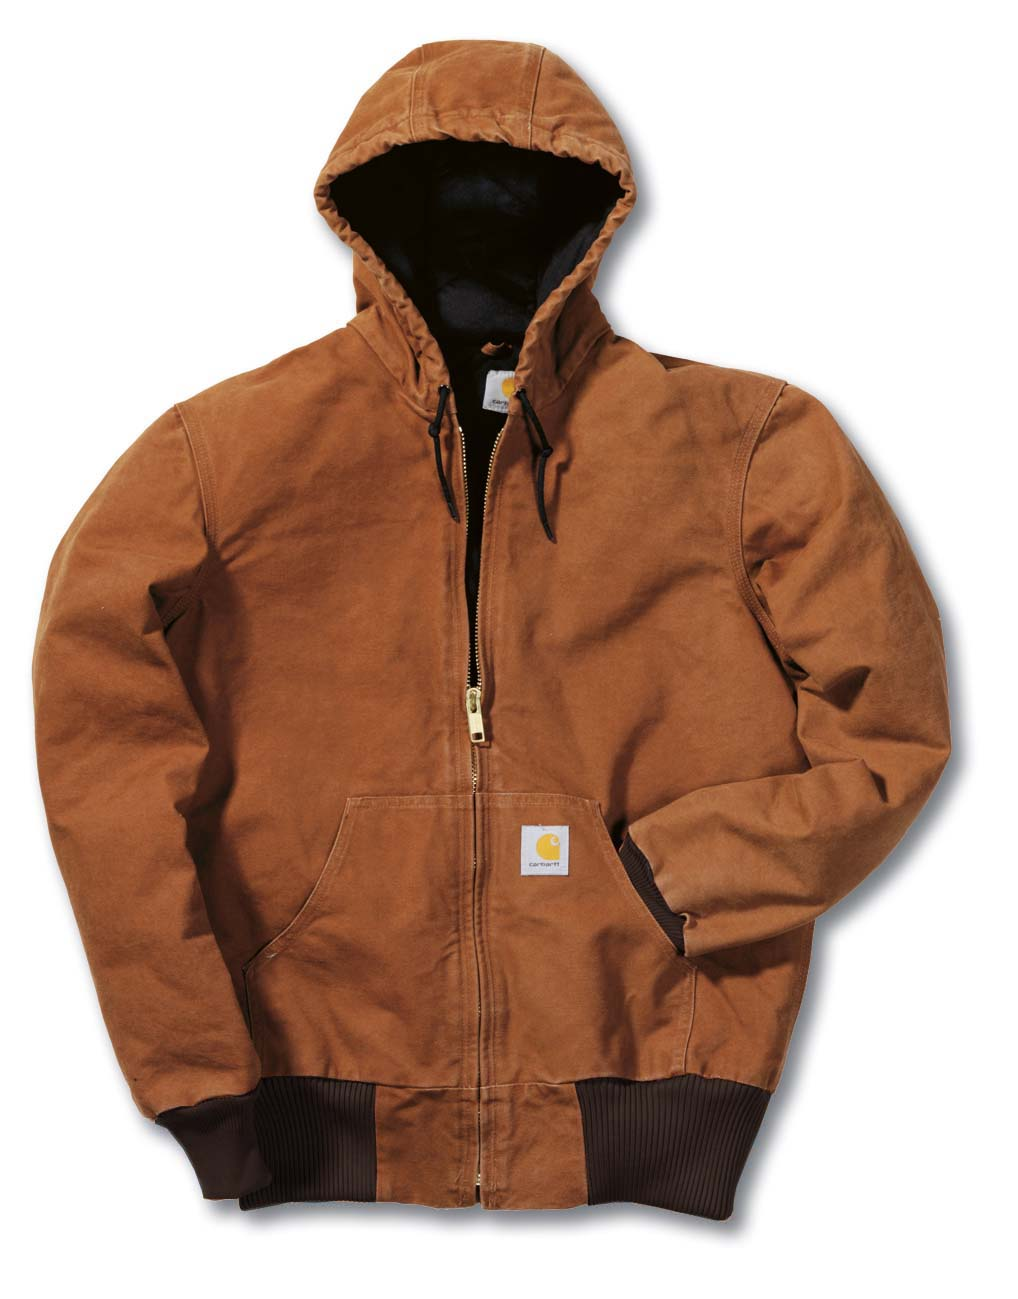 CARHARTT-braun-EJ130-Sandstone-Active-Jacket-Jacke-NEU